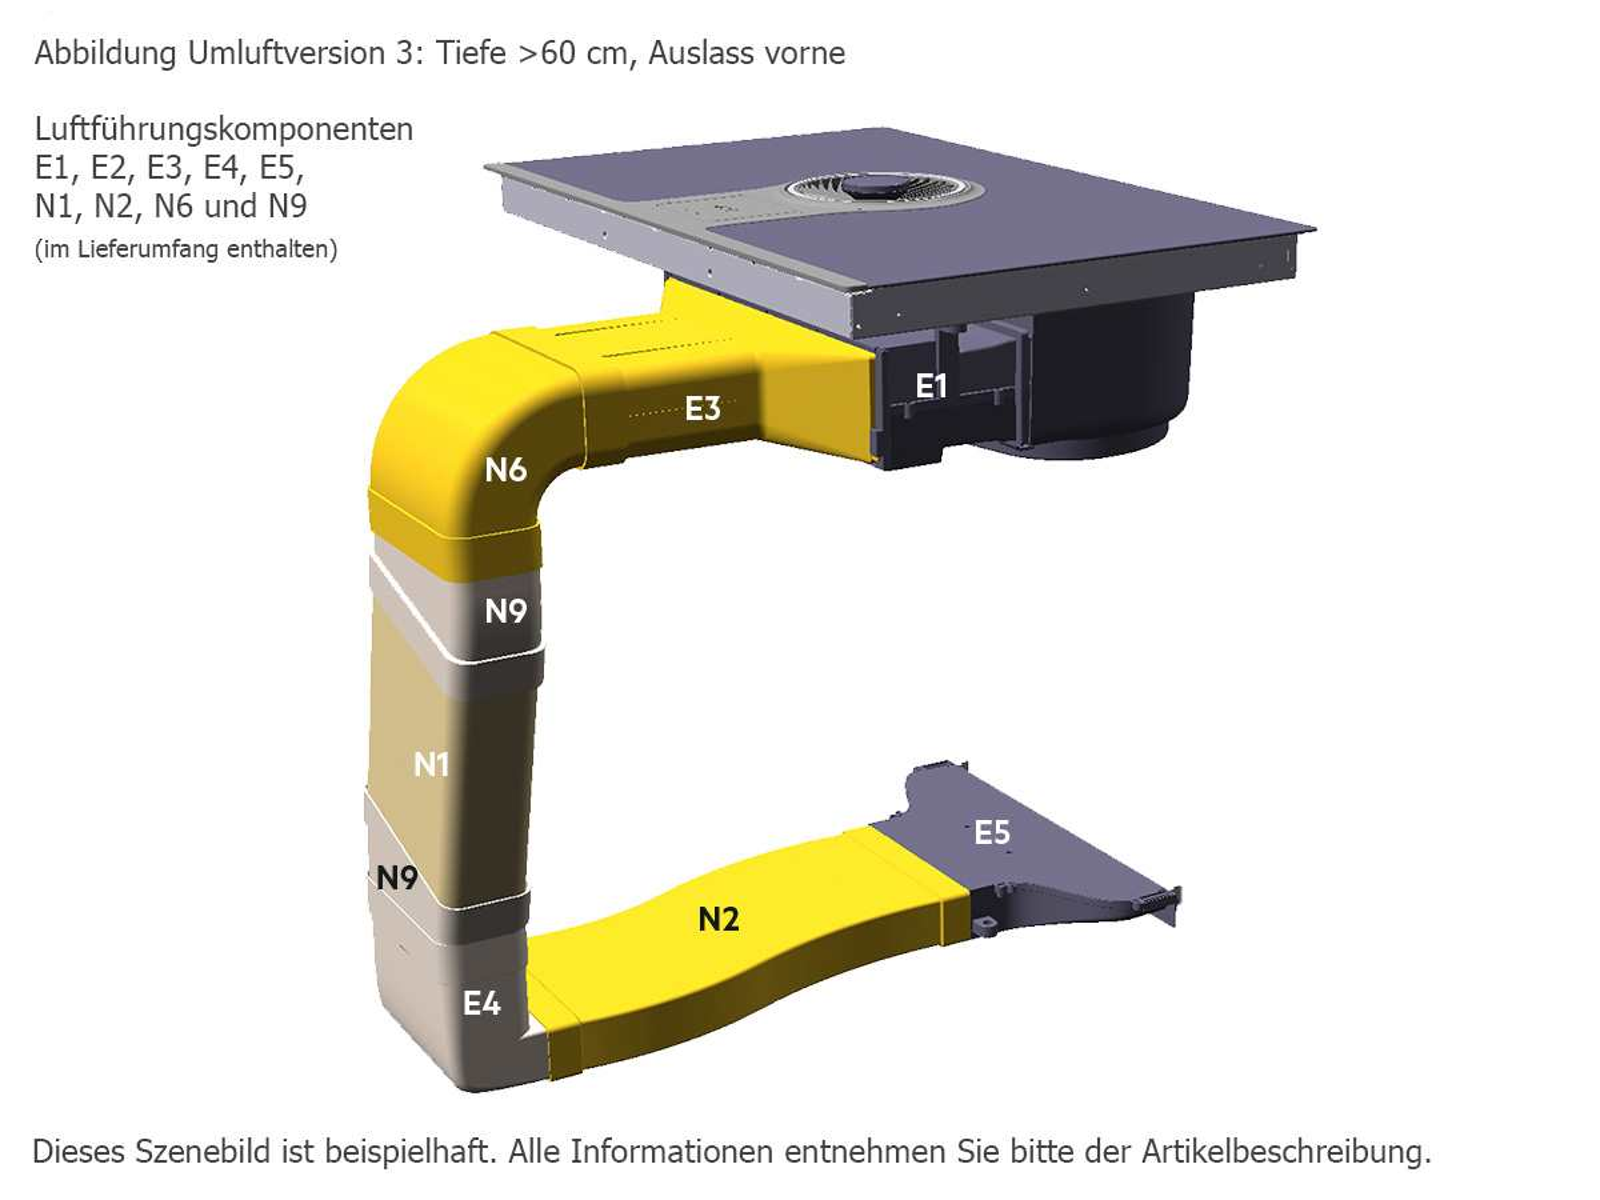 aeg combohob ide84241i b induktionskochfeld dunstabzug kombination ebay. Black Bedroom Furniture Sets. Home Design Ideas